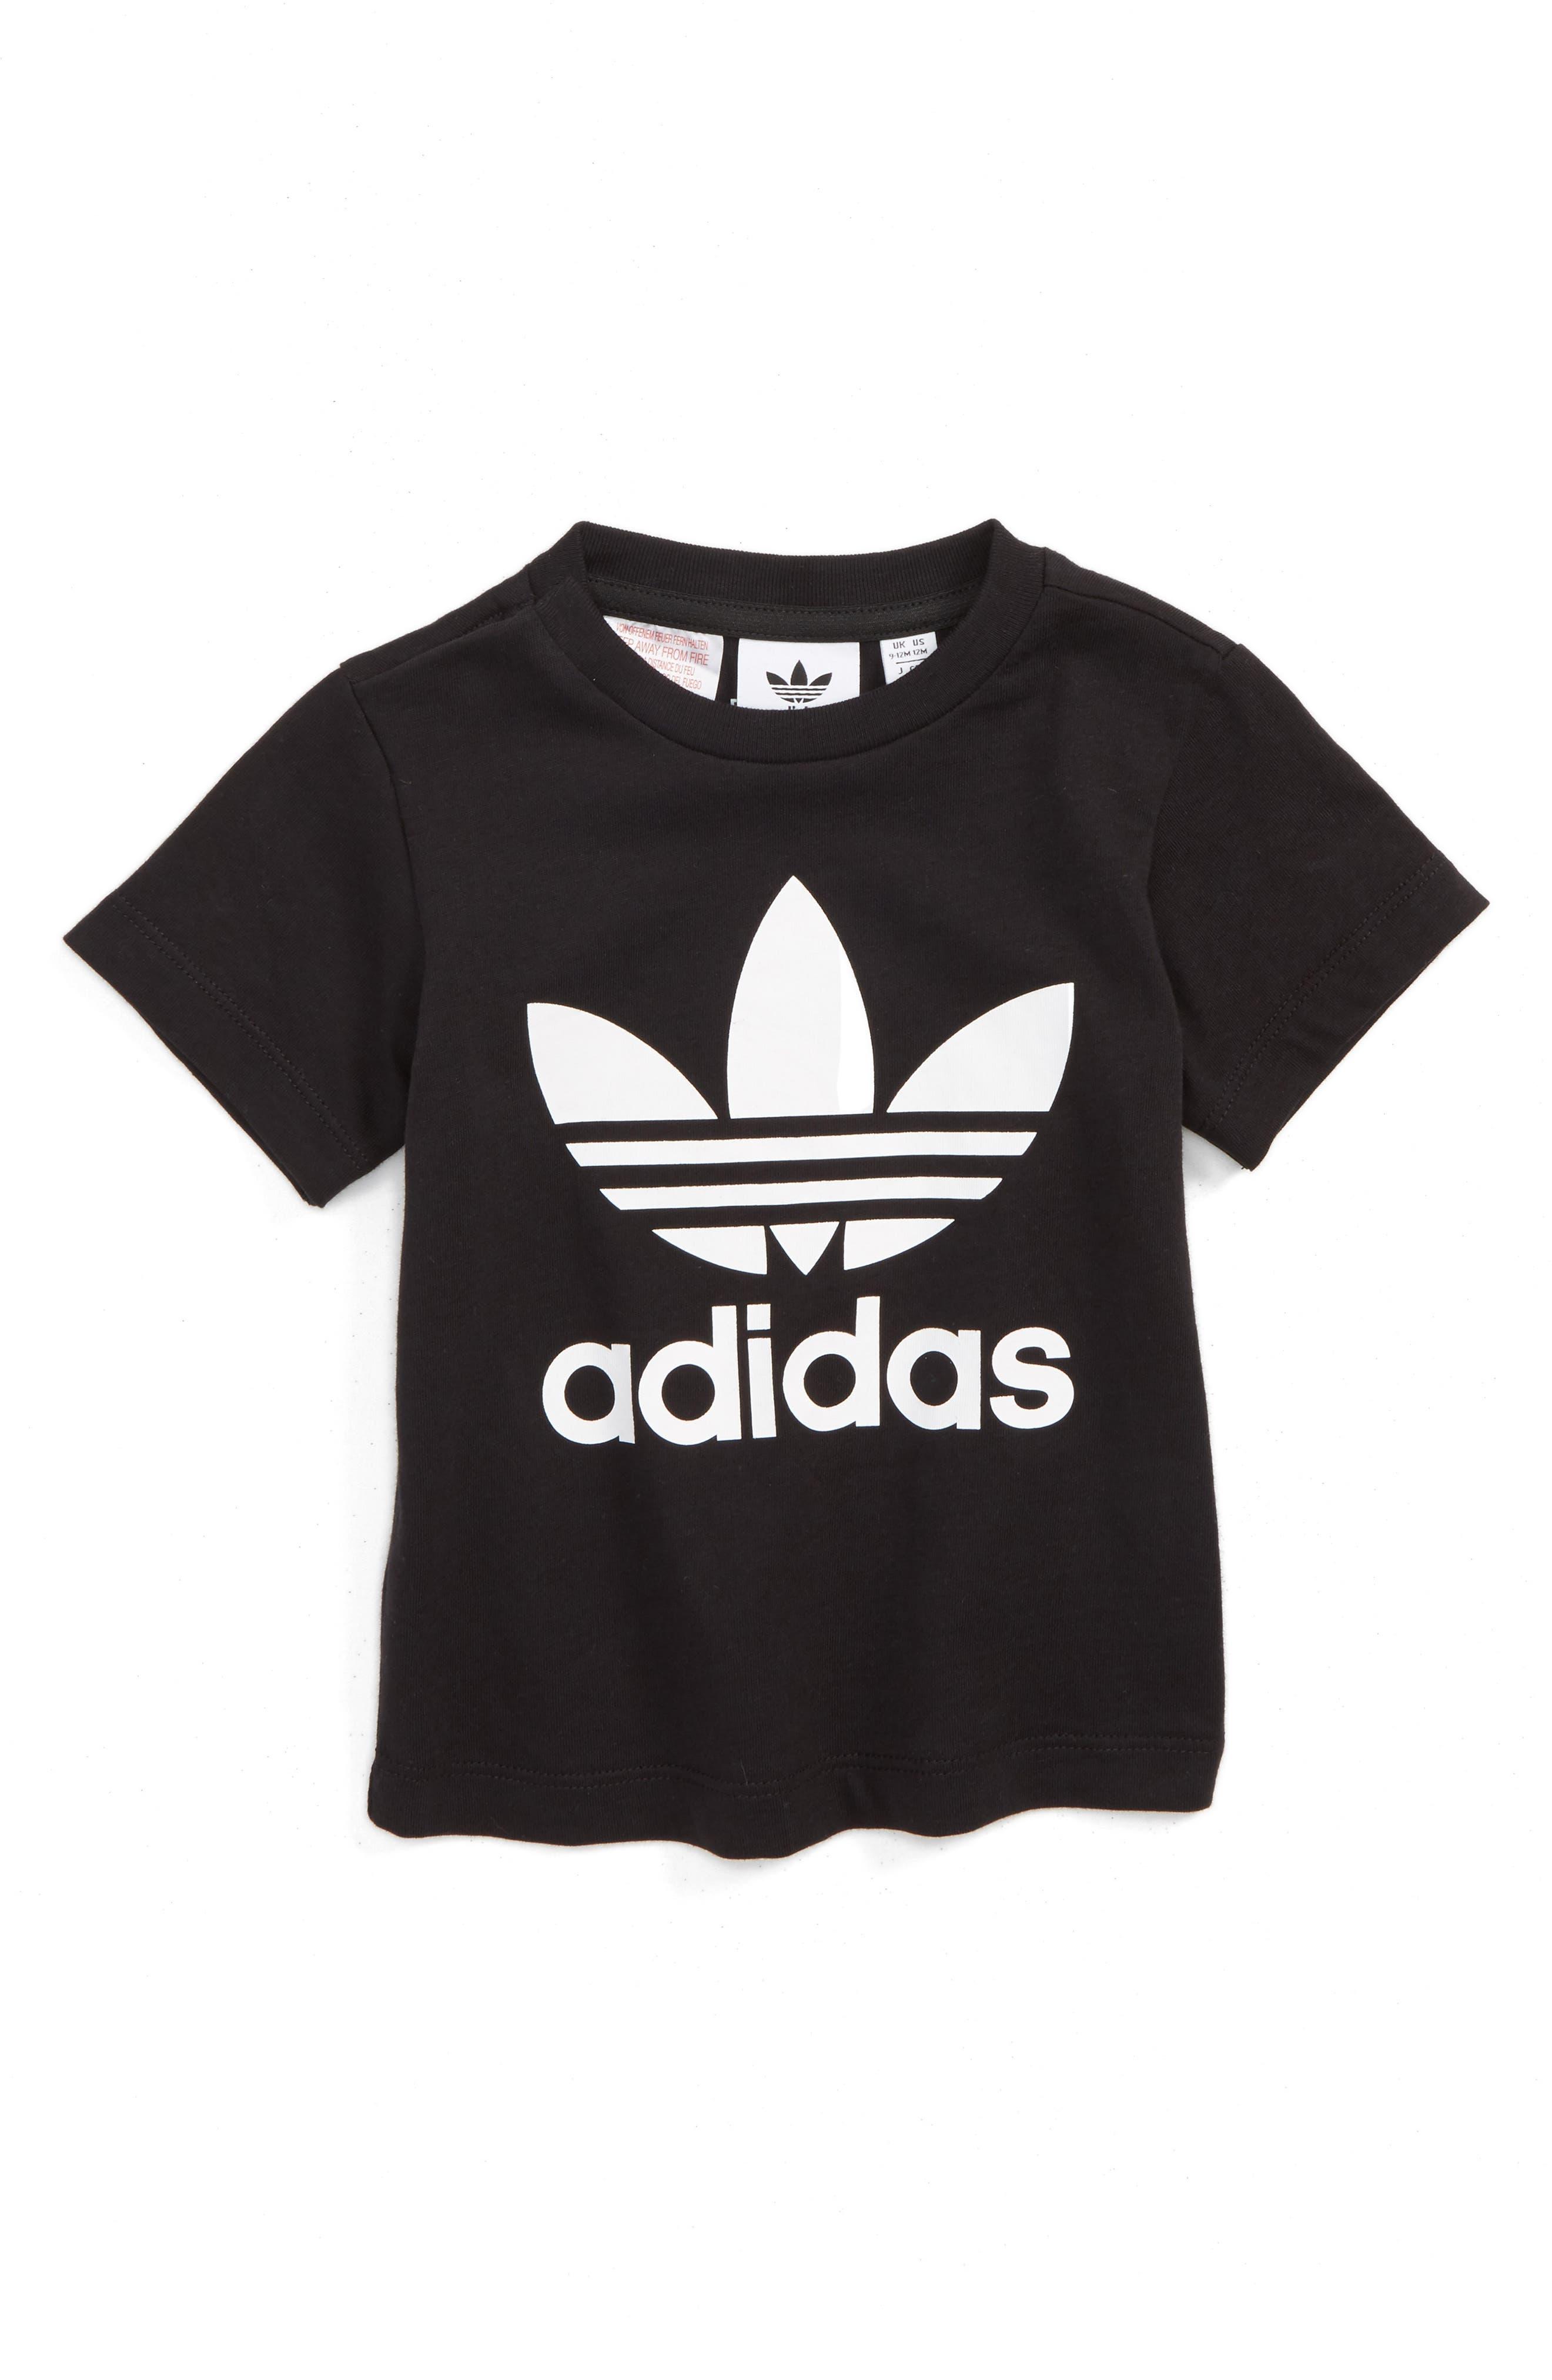 adidas Originals Trefoil Logo Tee (Baby)